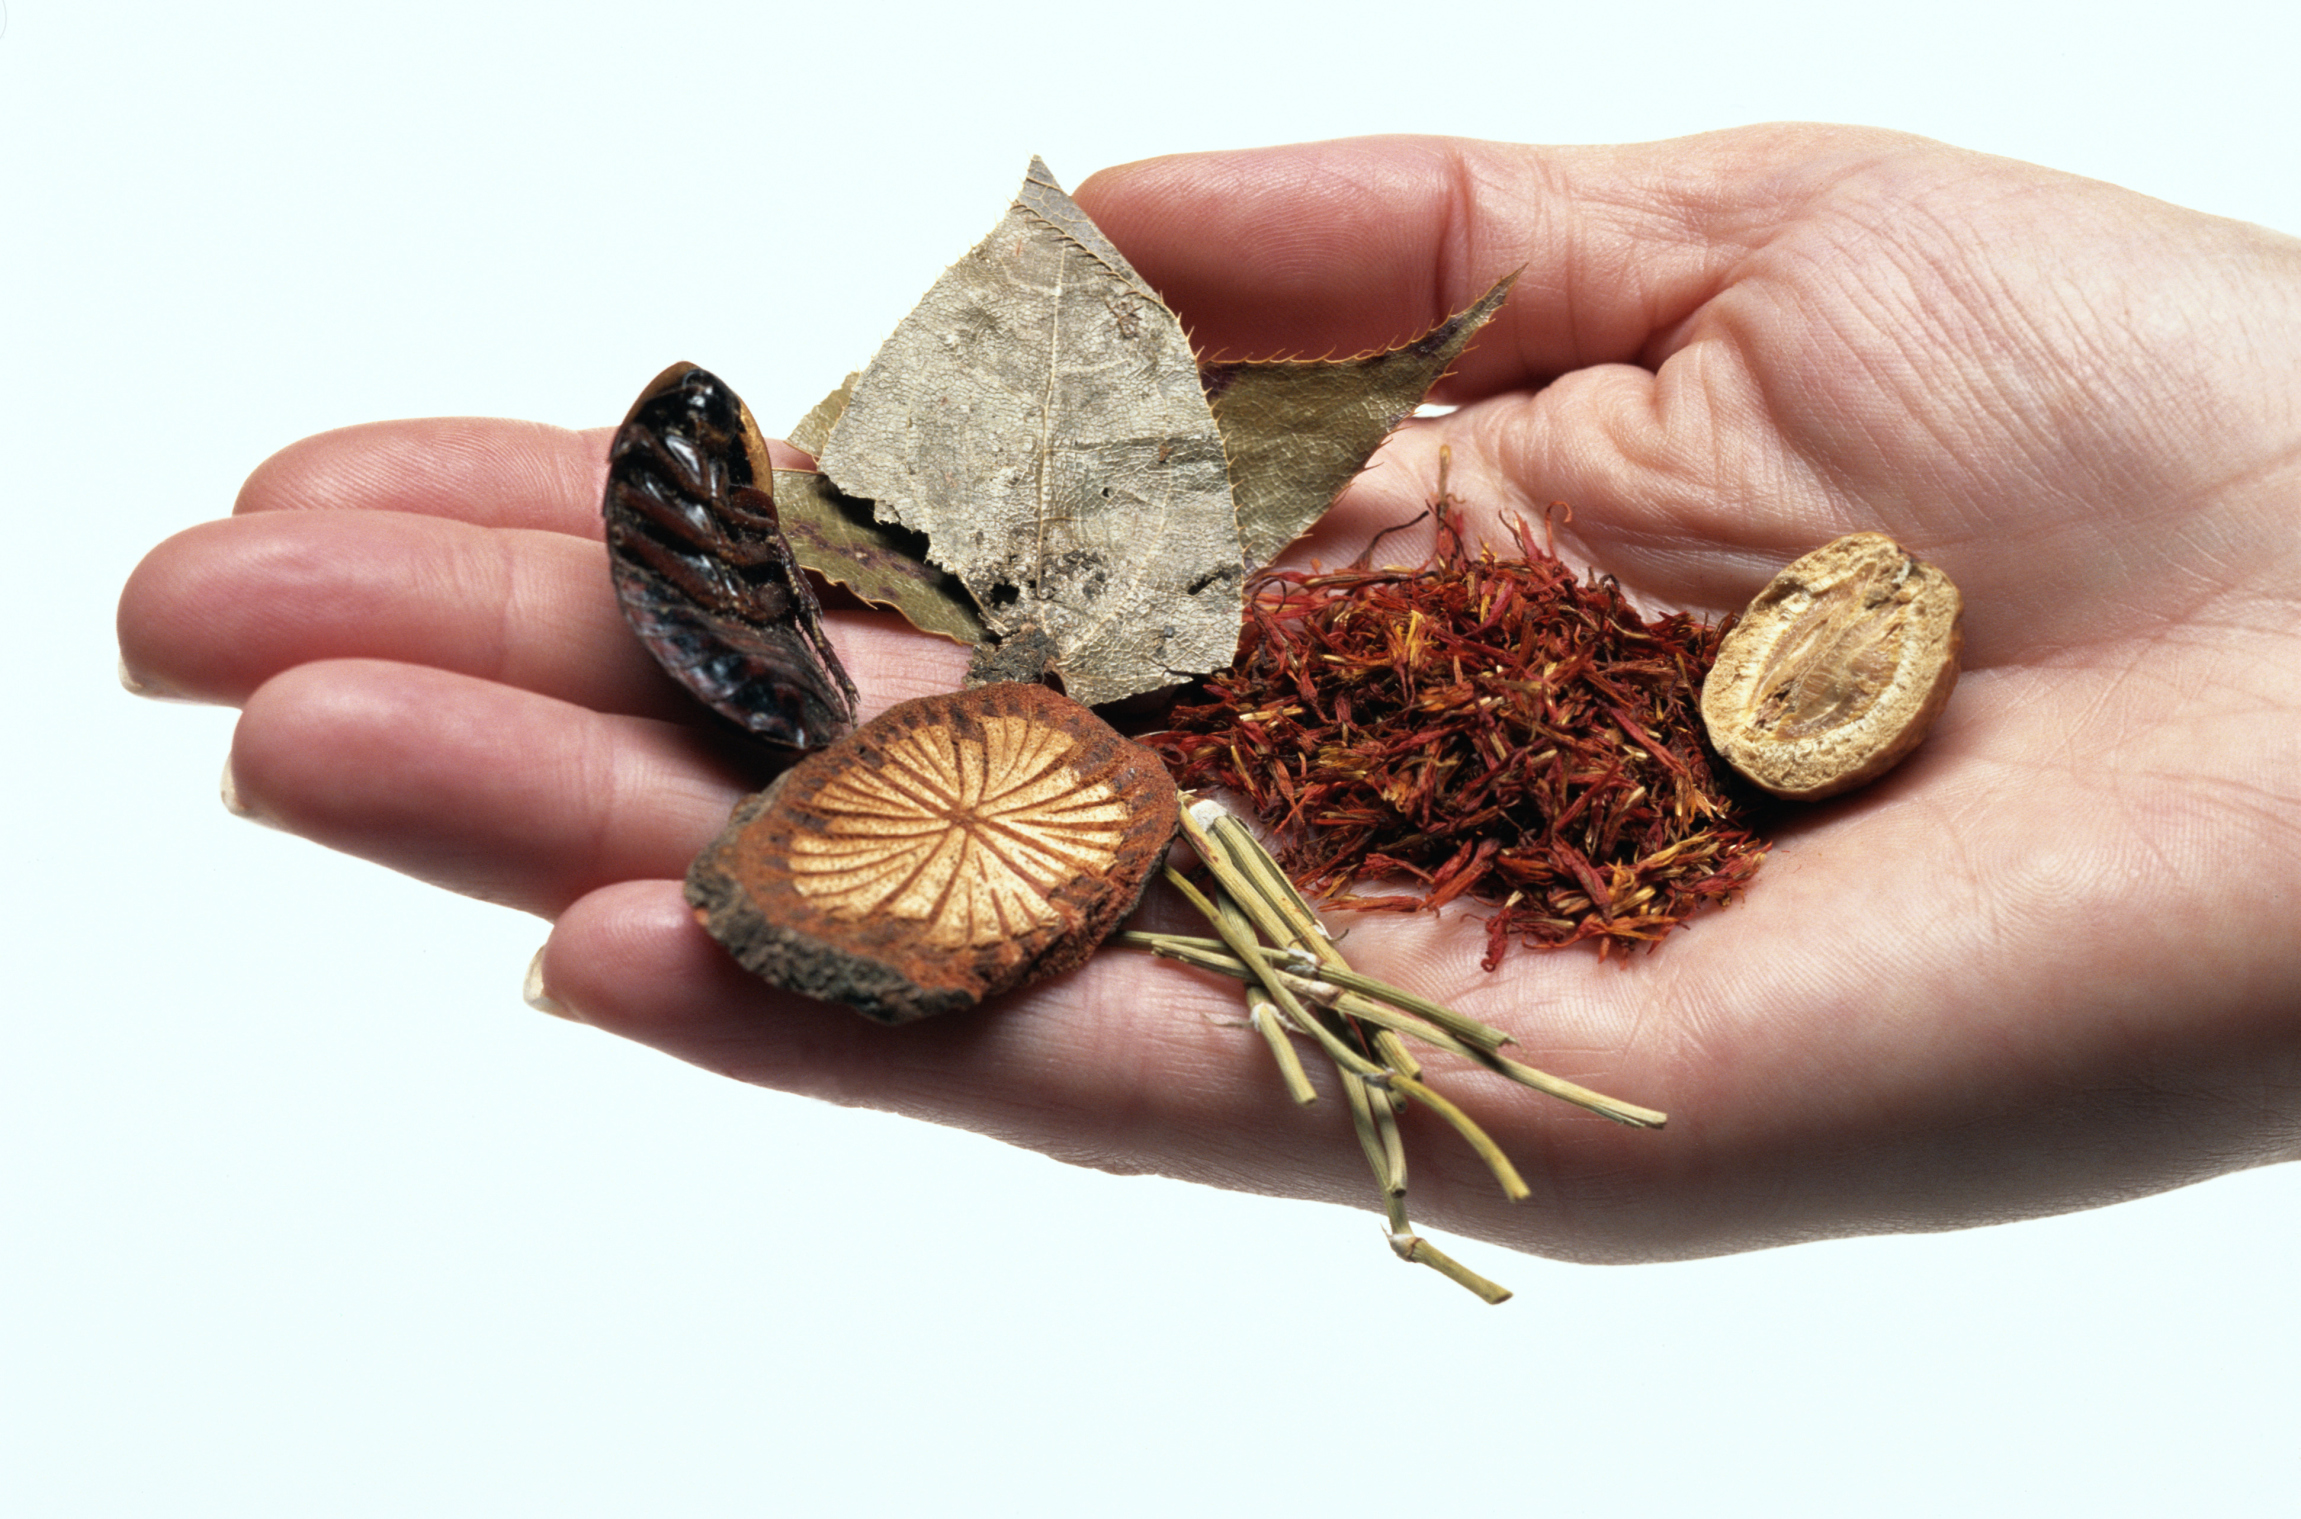 Dried herbs can add just as much flavor as salt.